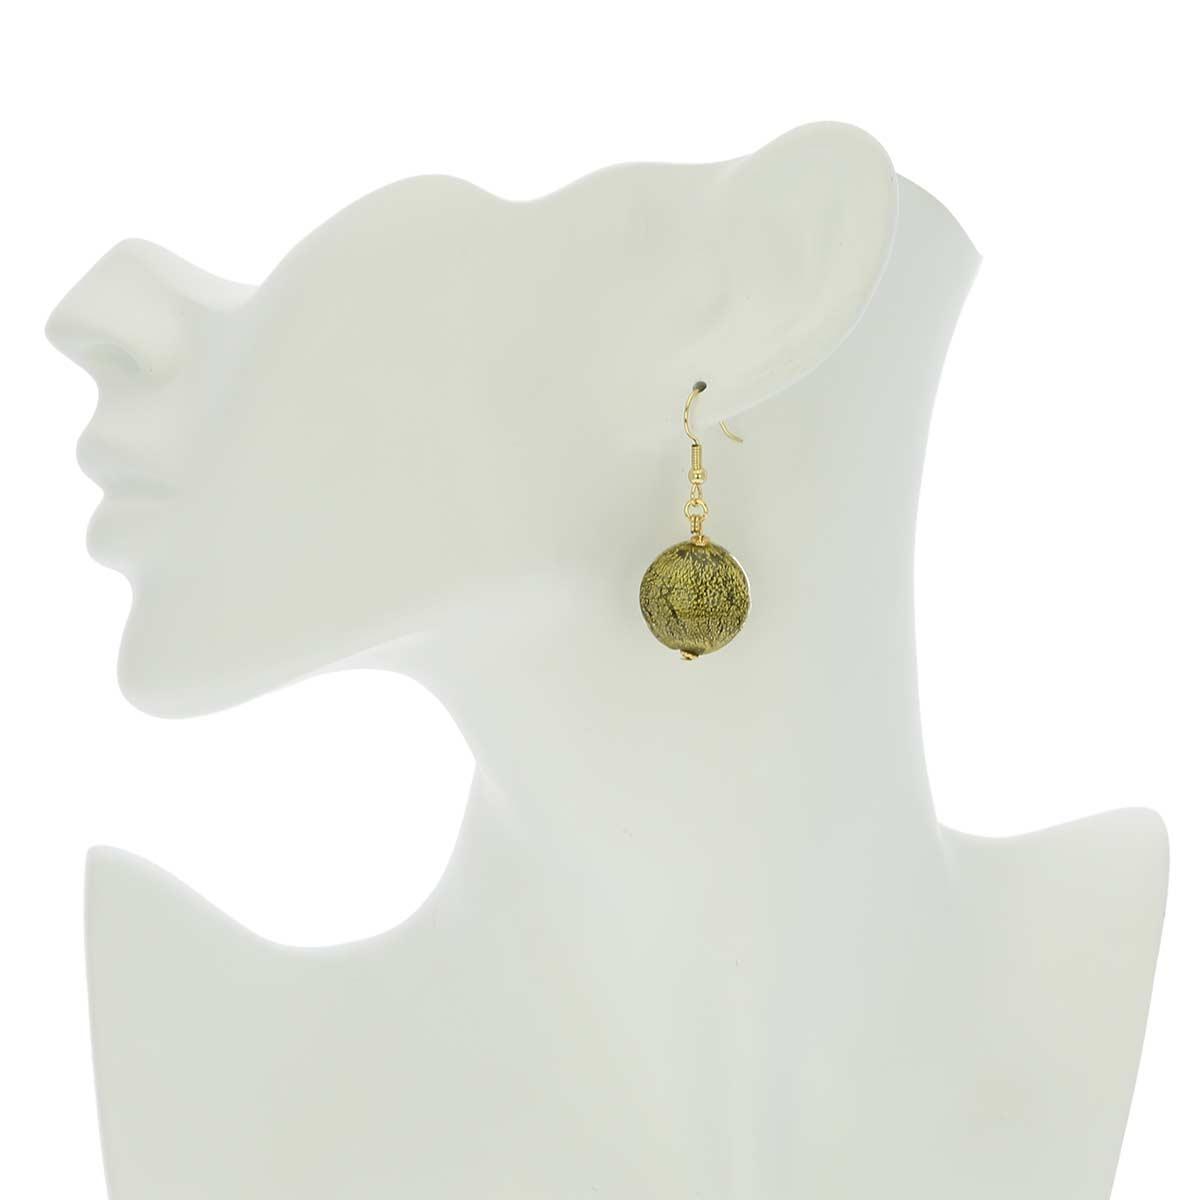 Ca D\'Oro earrings - cloudy sky